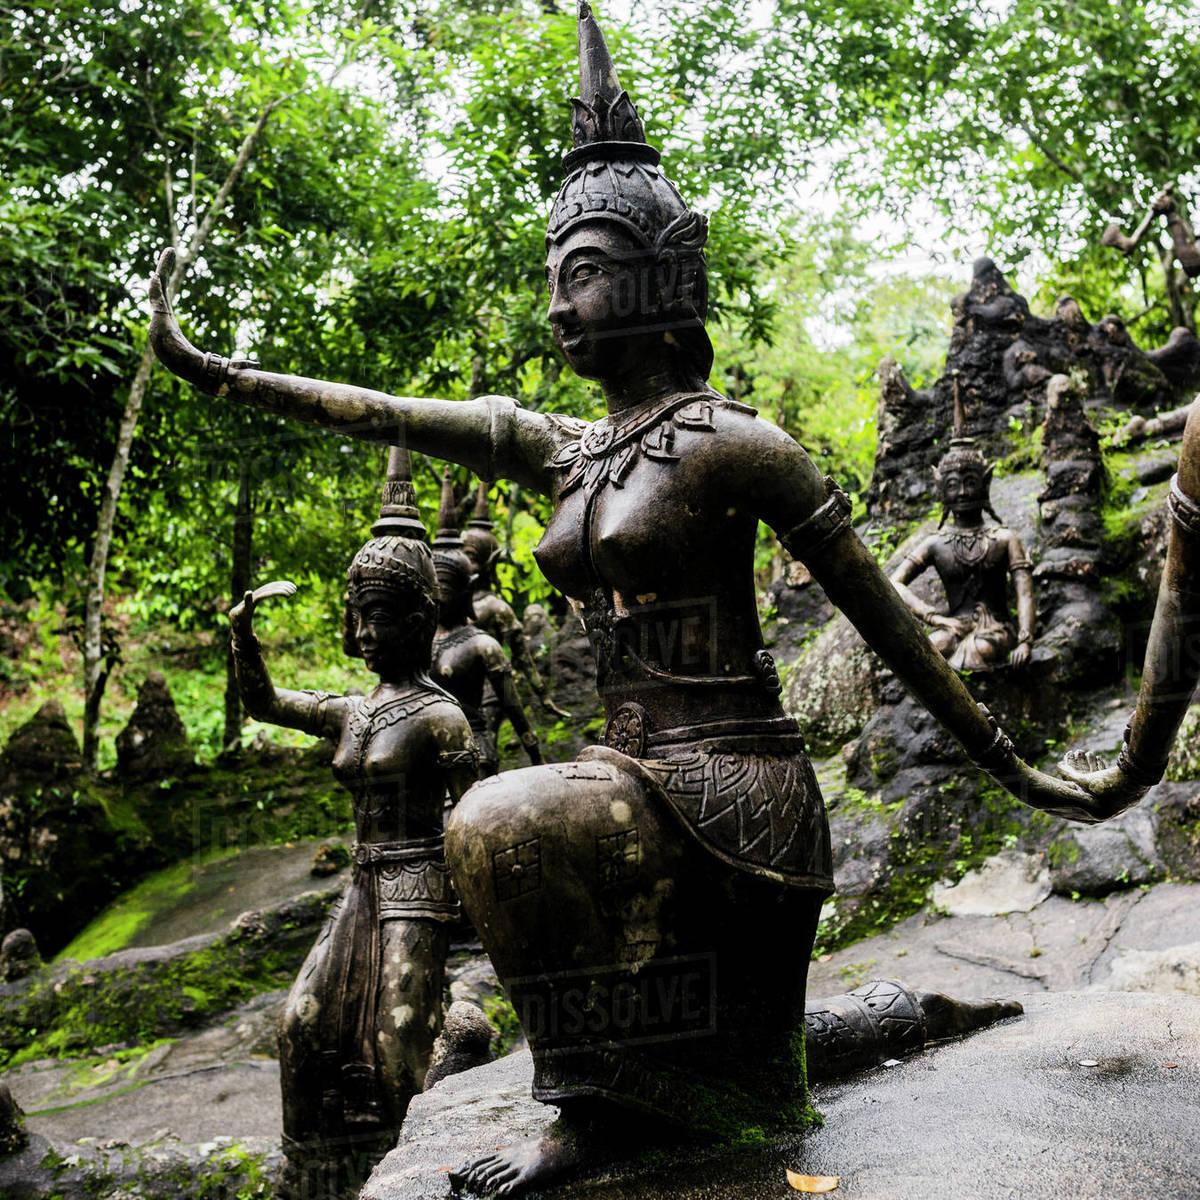 Secret Buddha Garden Statues In Rainforest Koh Samui Thailand Stock Photo Dissolve